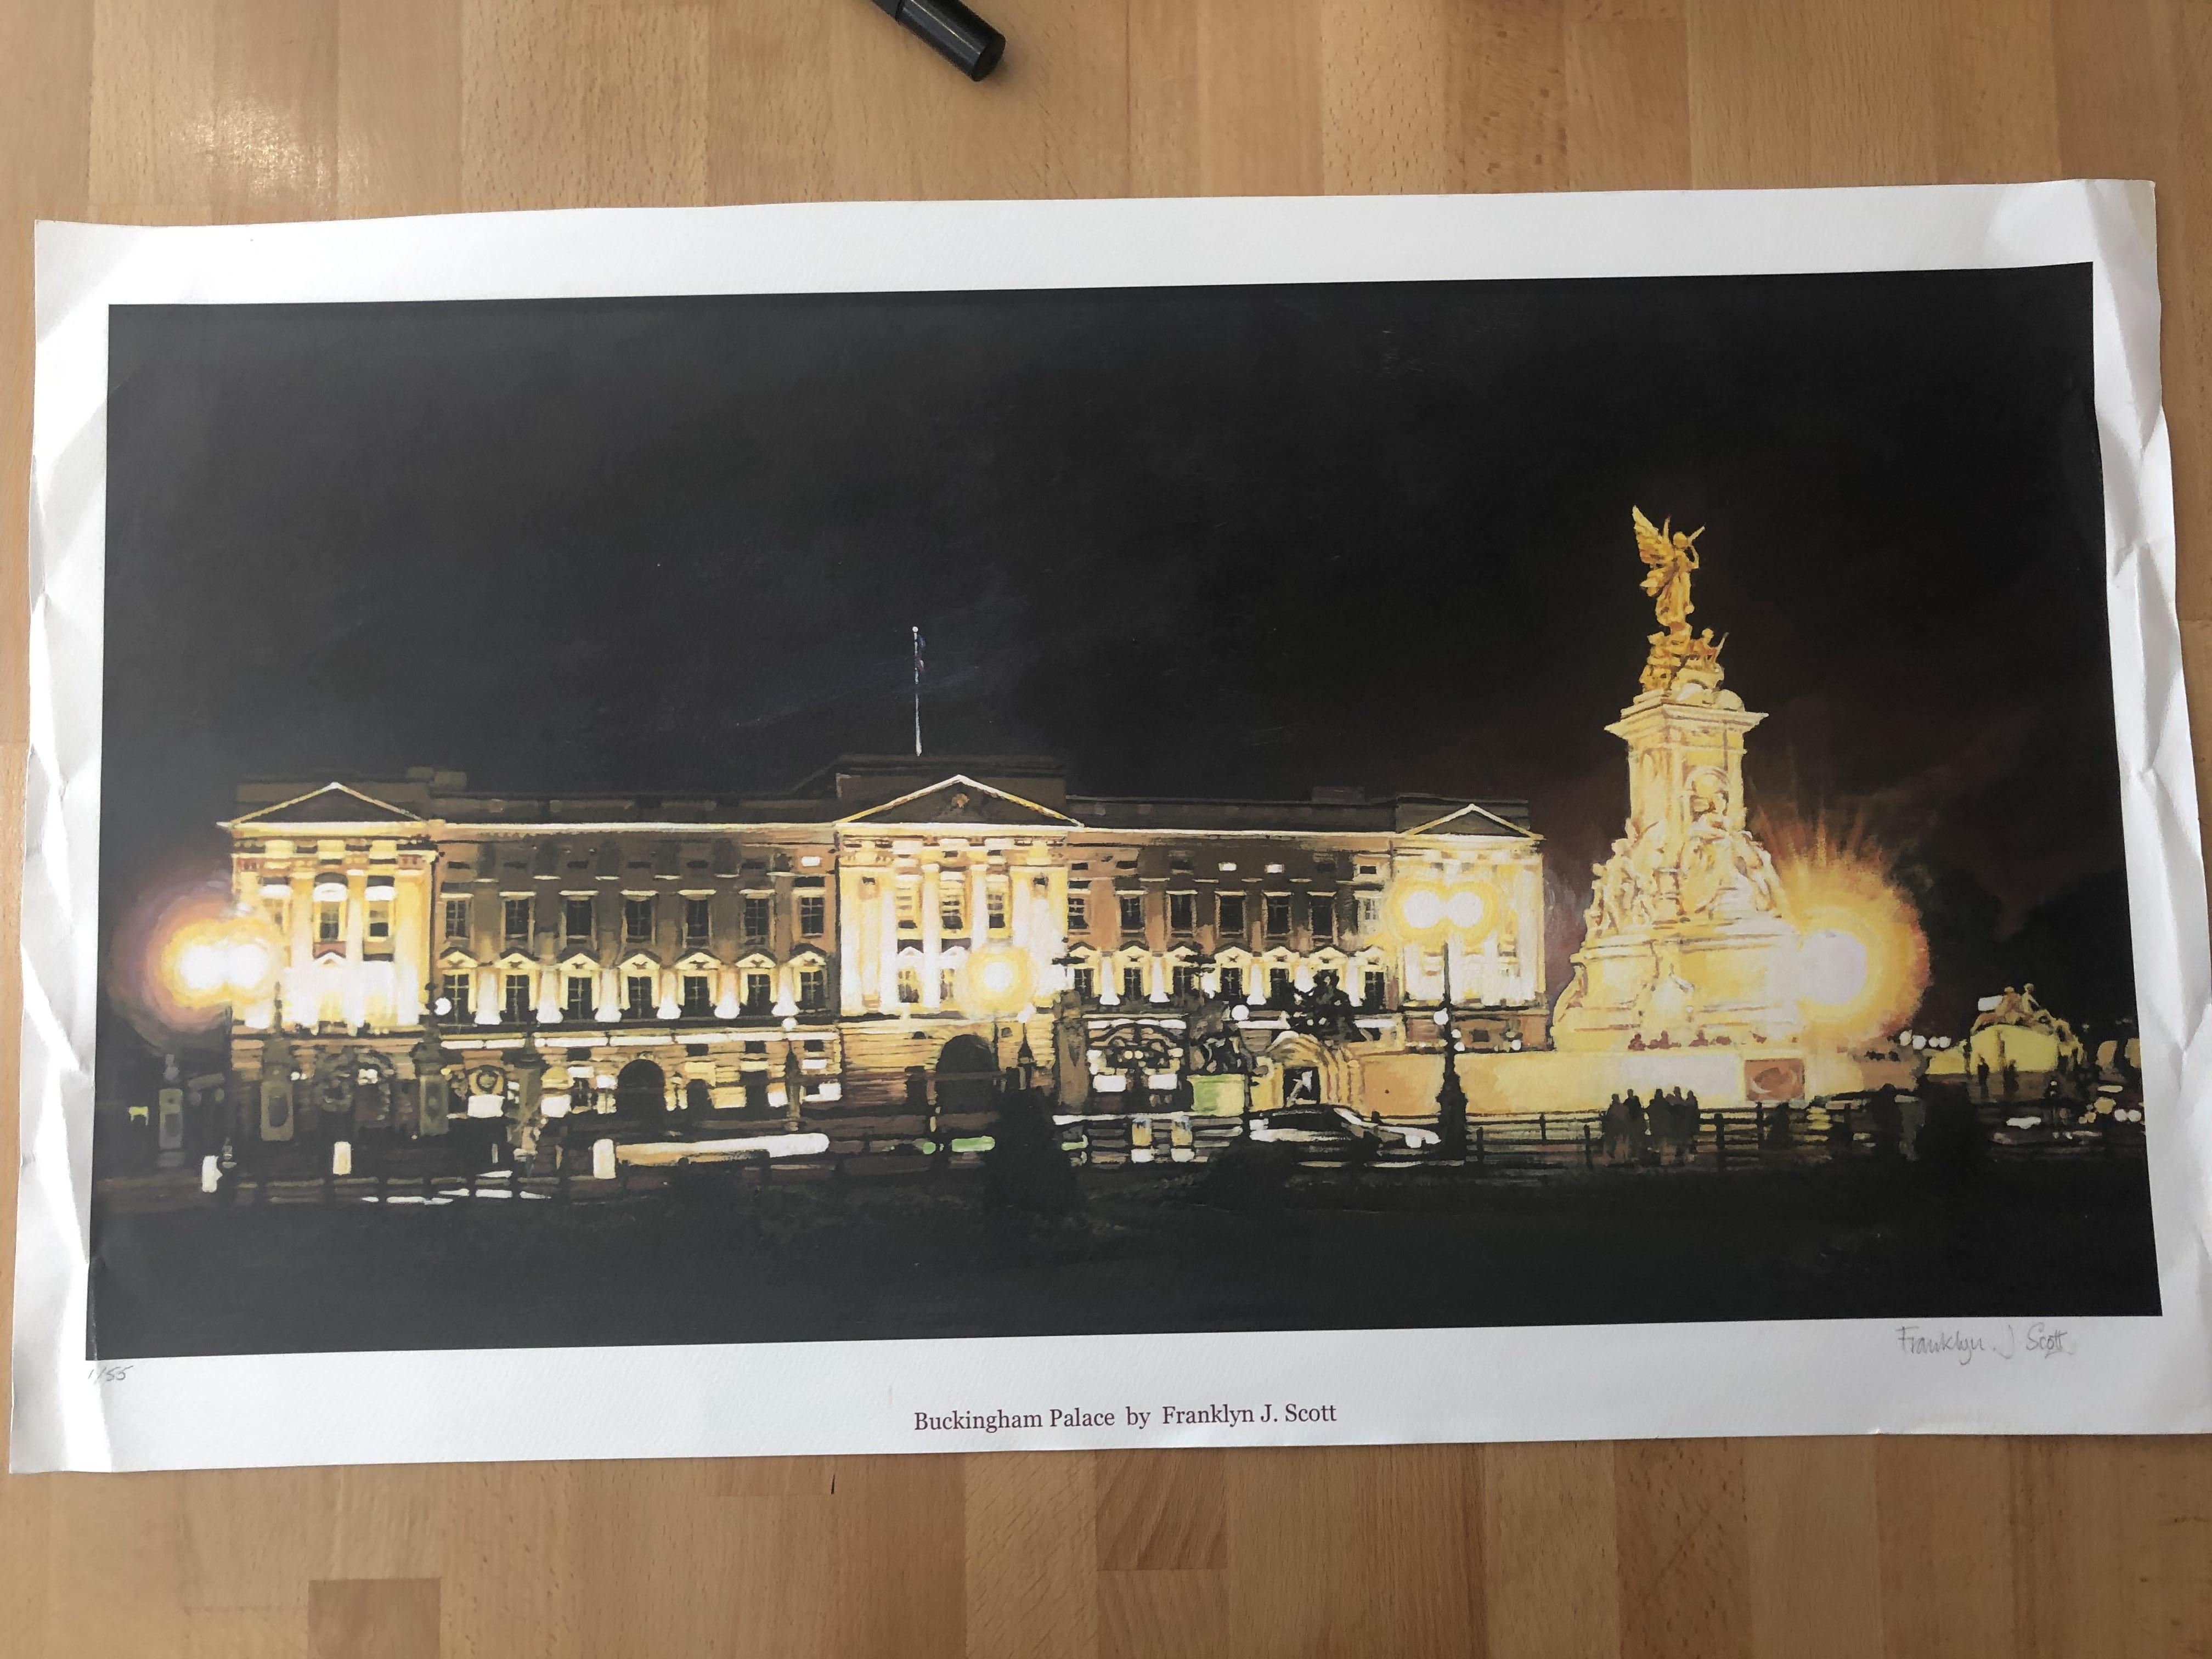 Lot 25 - Franklyn J Scott Limited Edition Prints Signed. 3 x Buckingham Palace